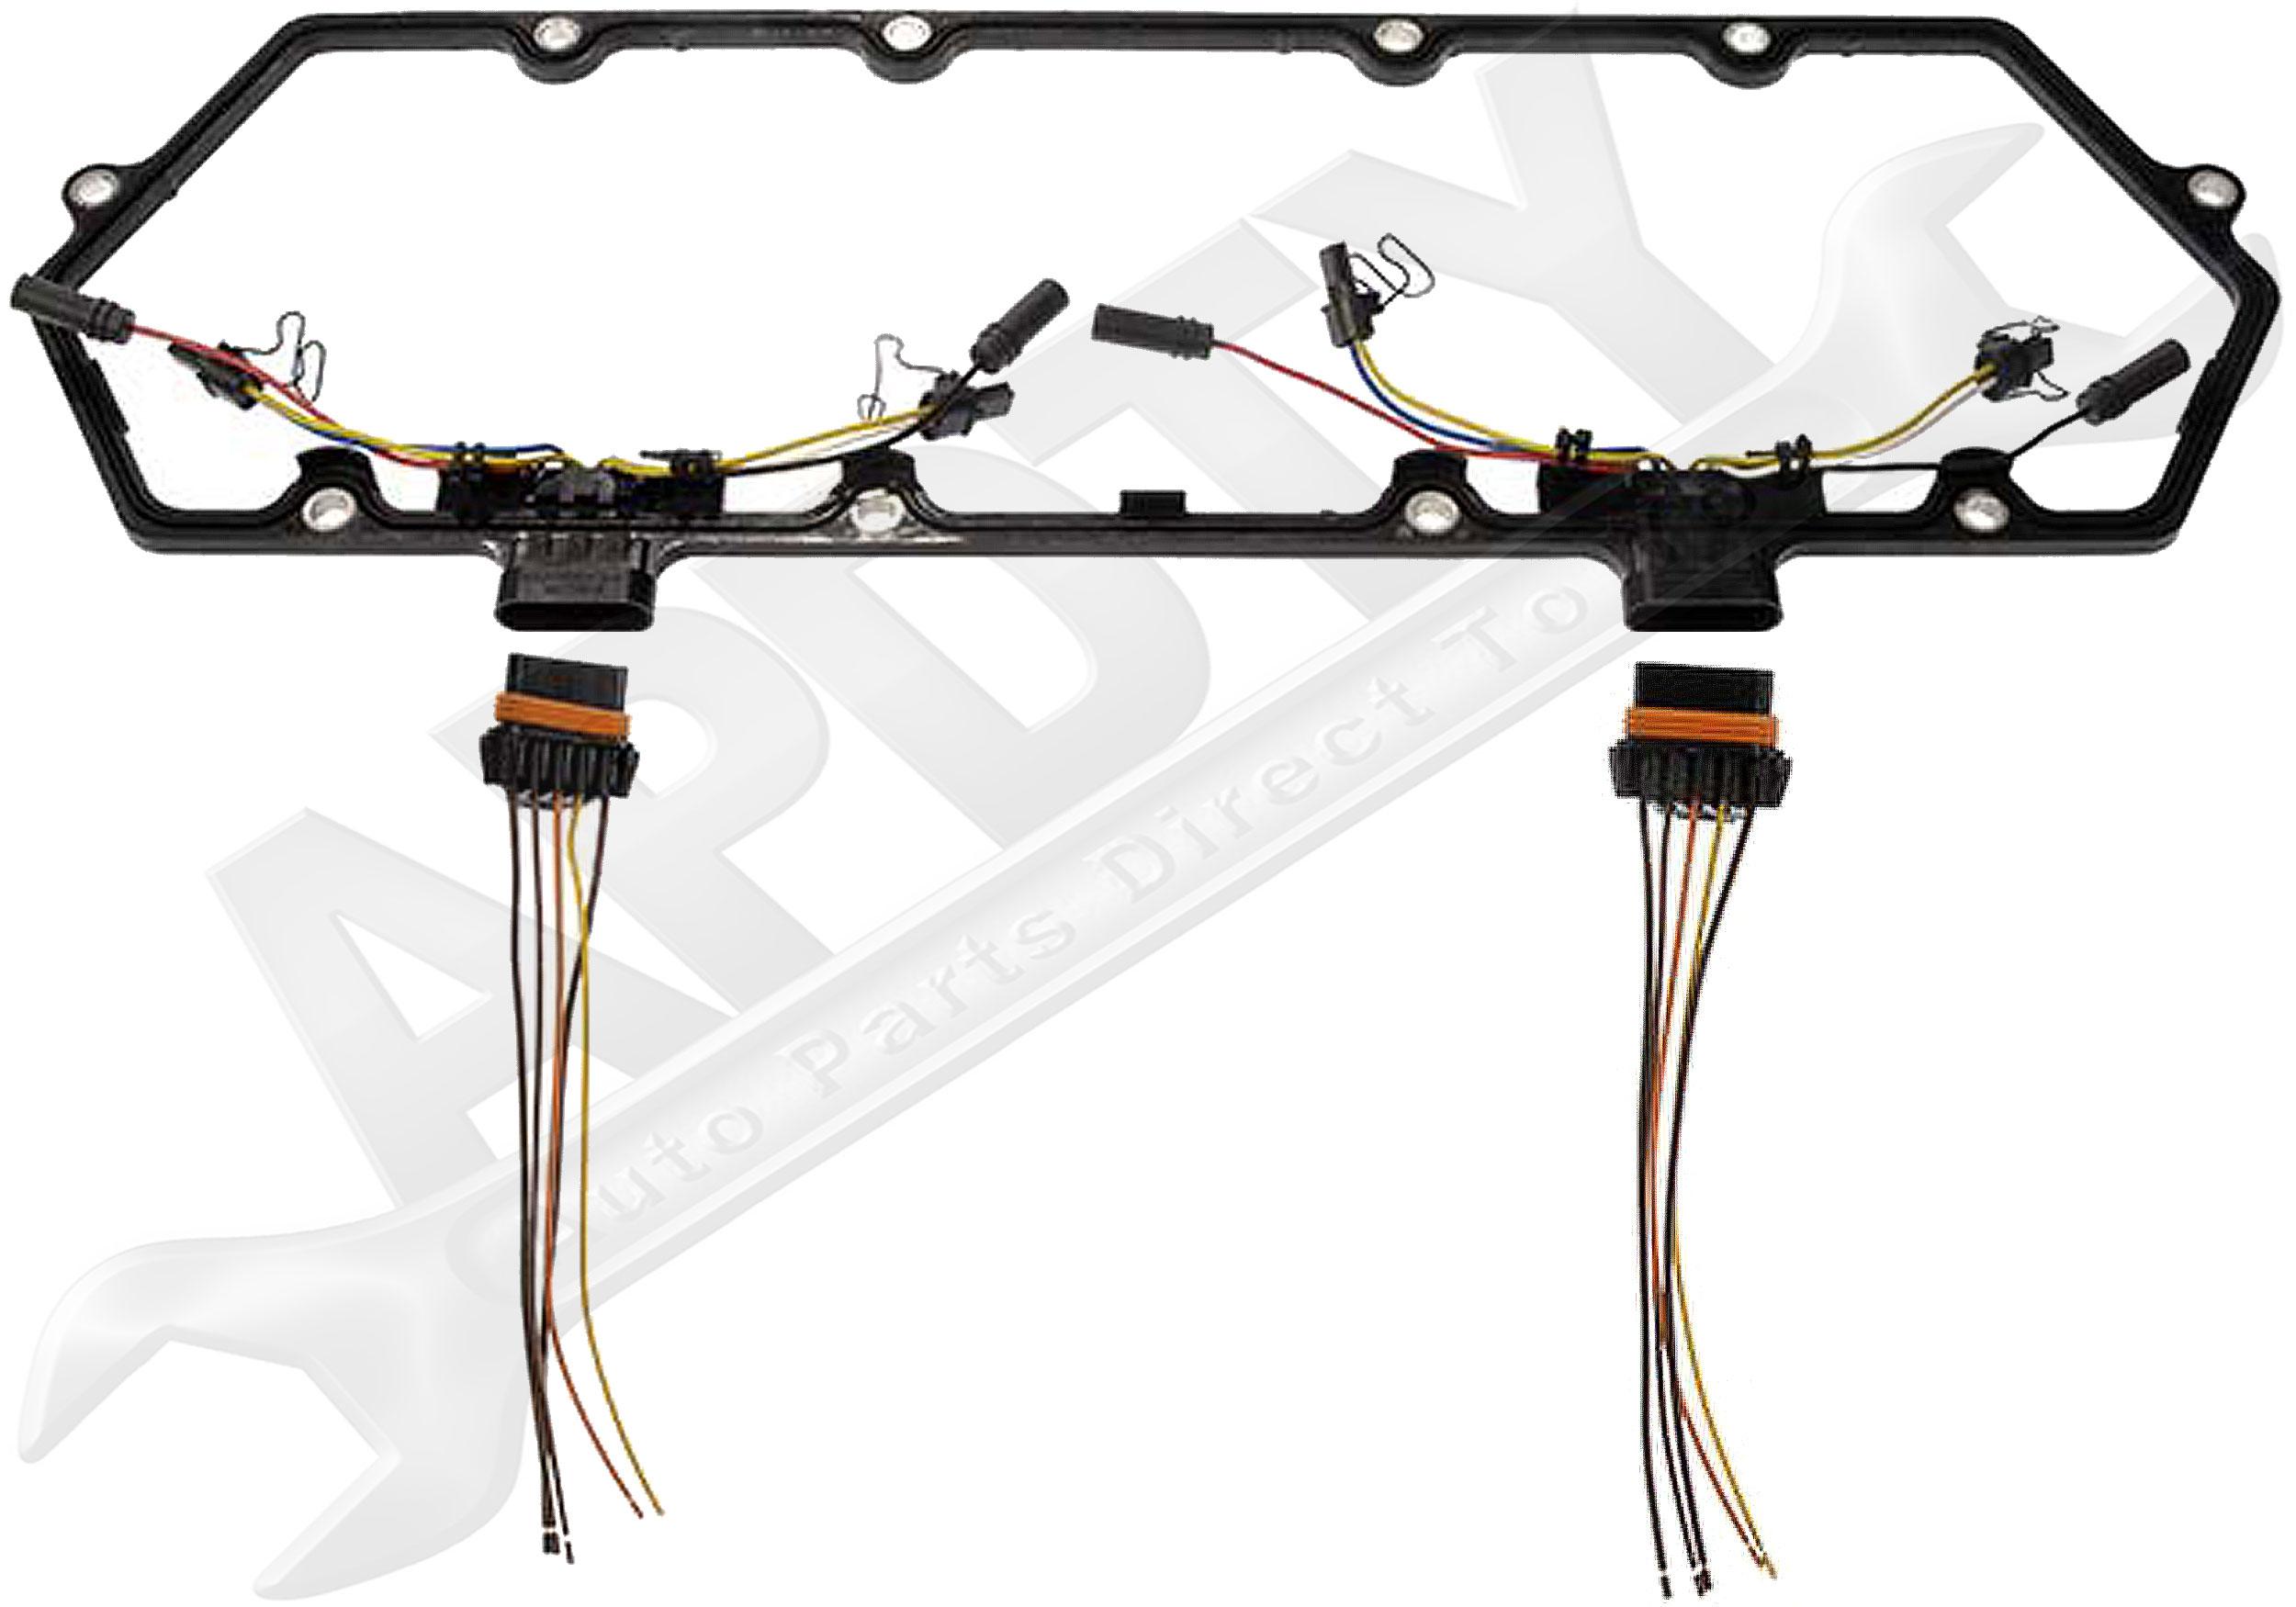 Lly Duramax Injector Wiring Harness Schematic Diagrams Diagram Download U2022